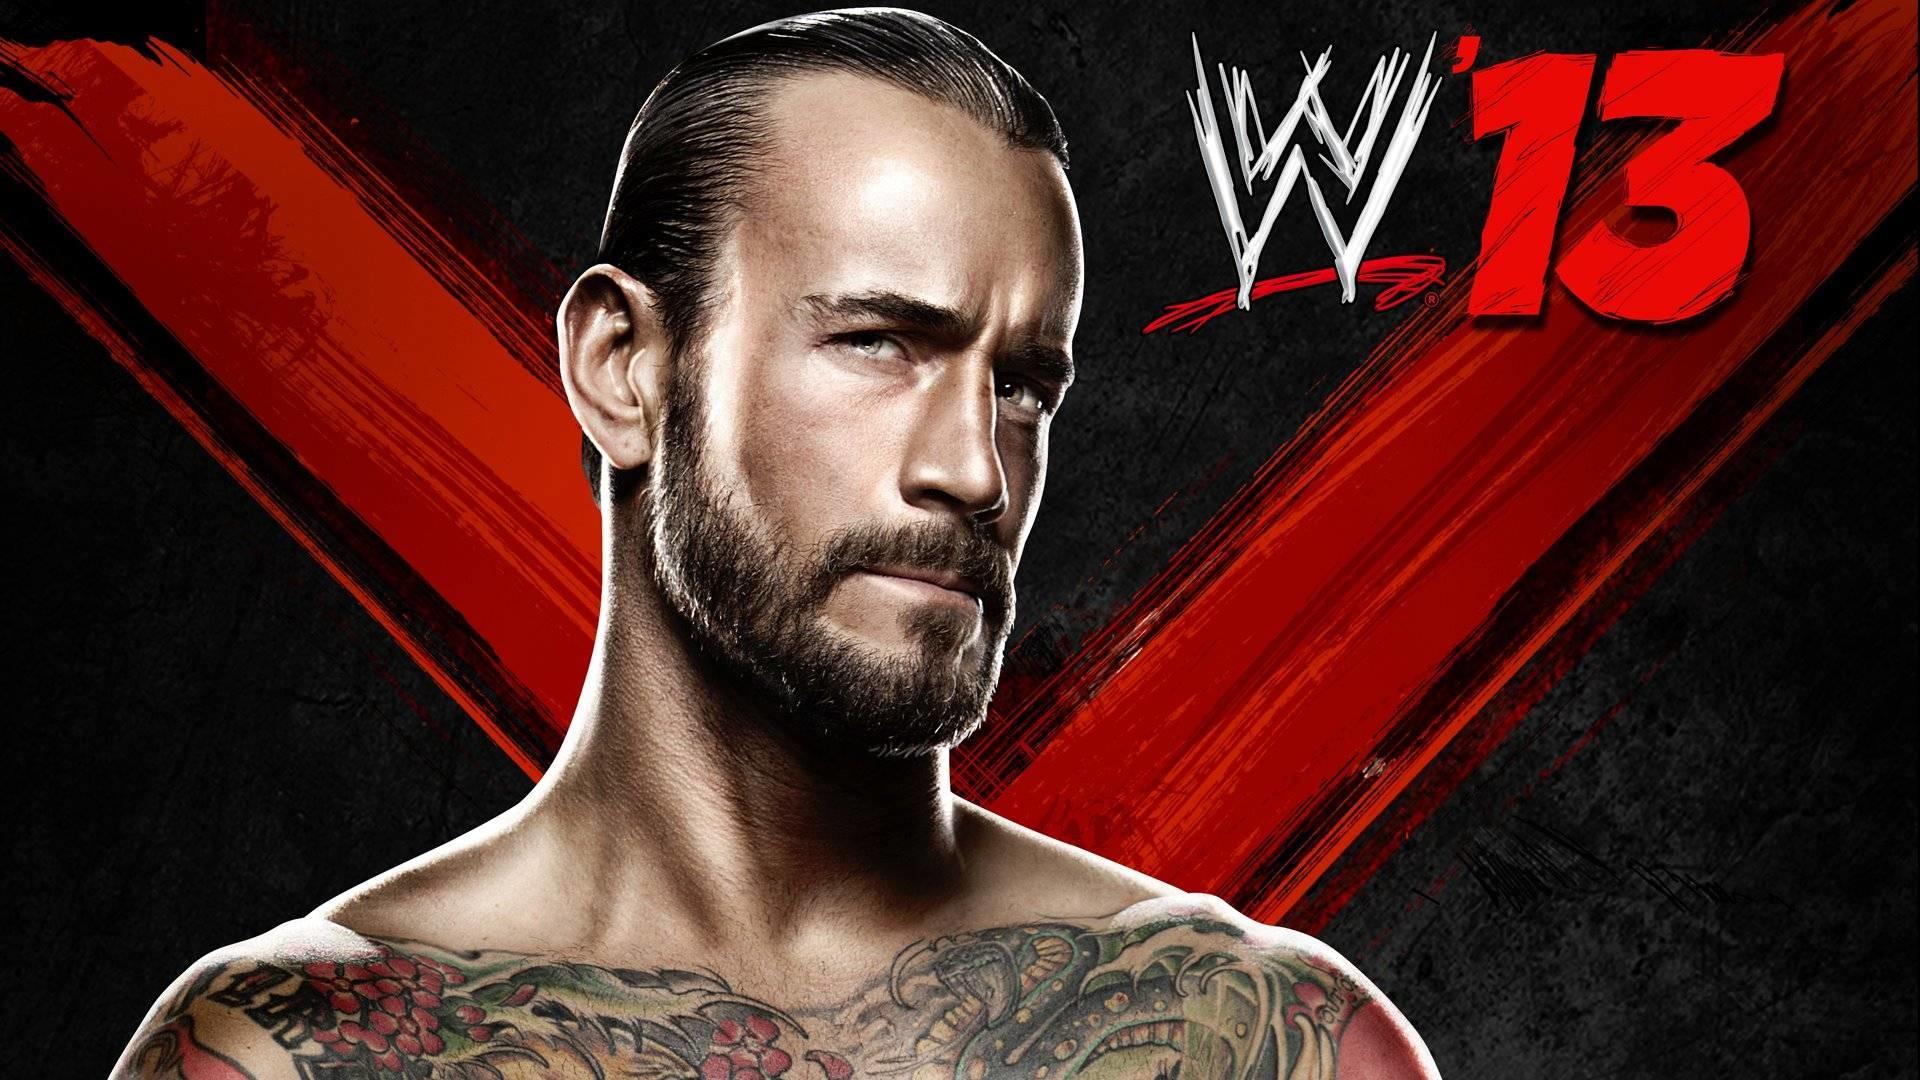 WWE 13 Wallpapers in HD Â« GamingBolt.com: Video Game News, Reviews .